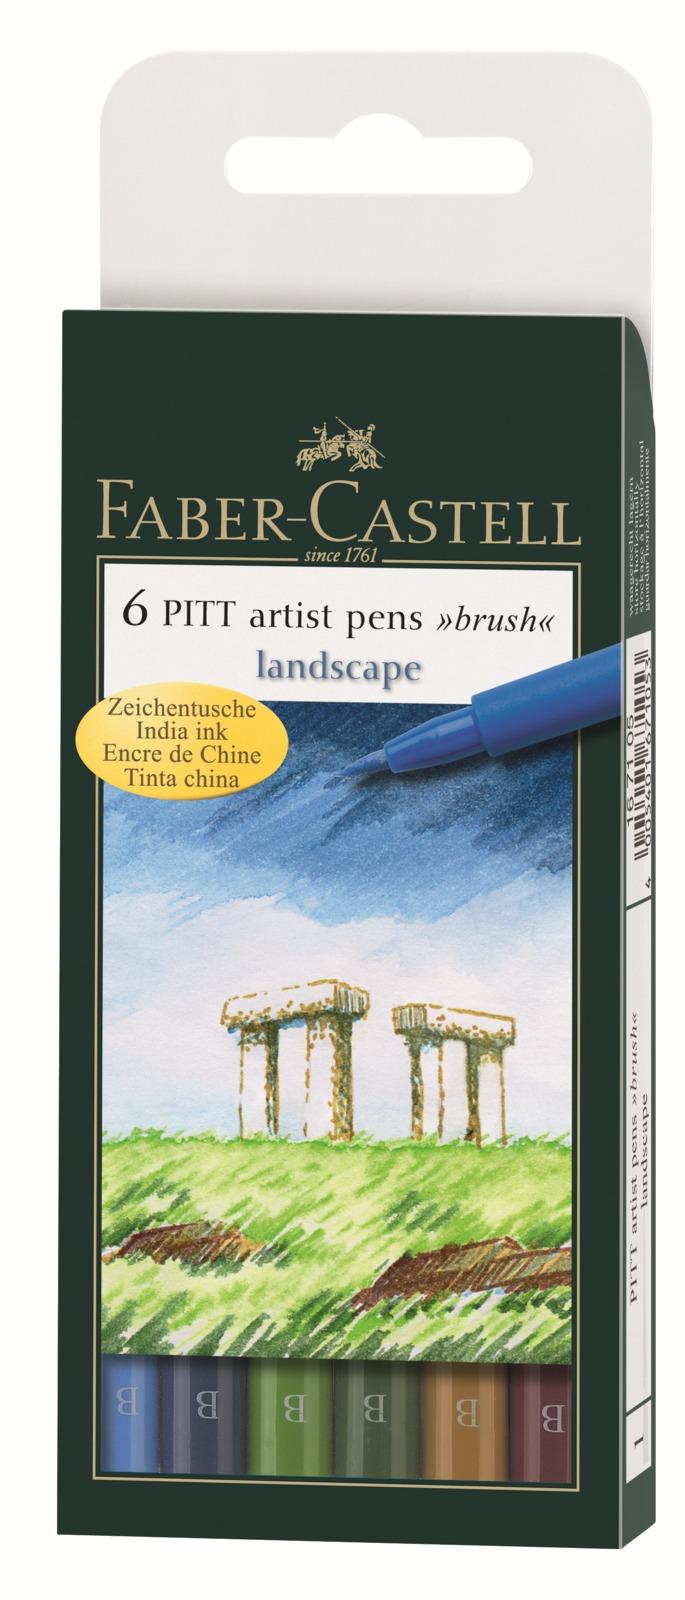 Faber-Castell: Pitt Artist Pens B Landscape (Wallet of 6) image